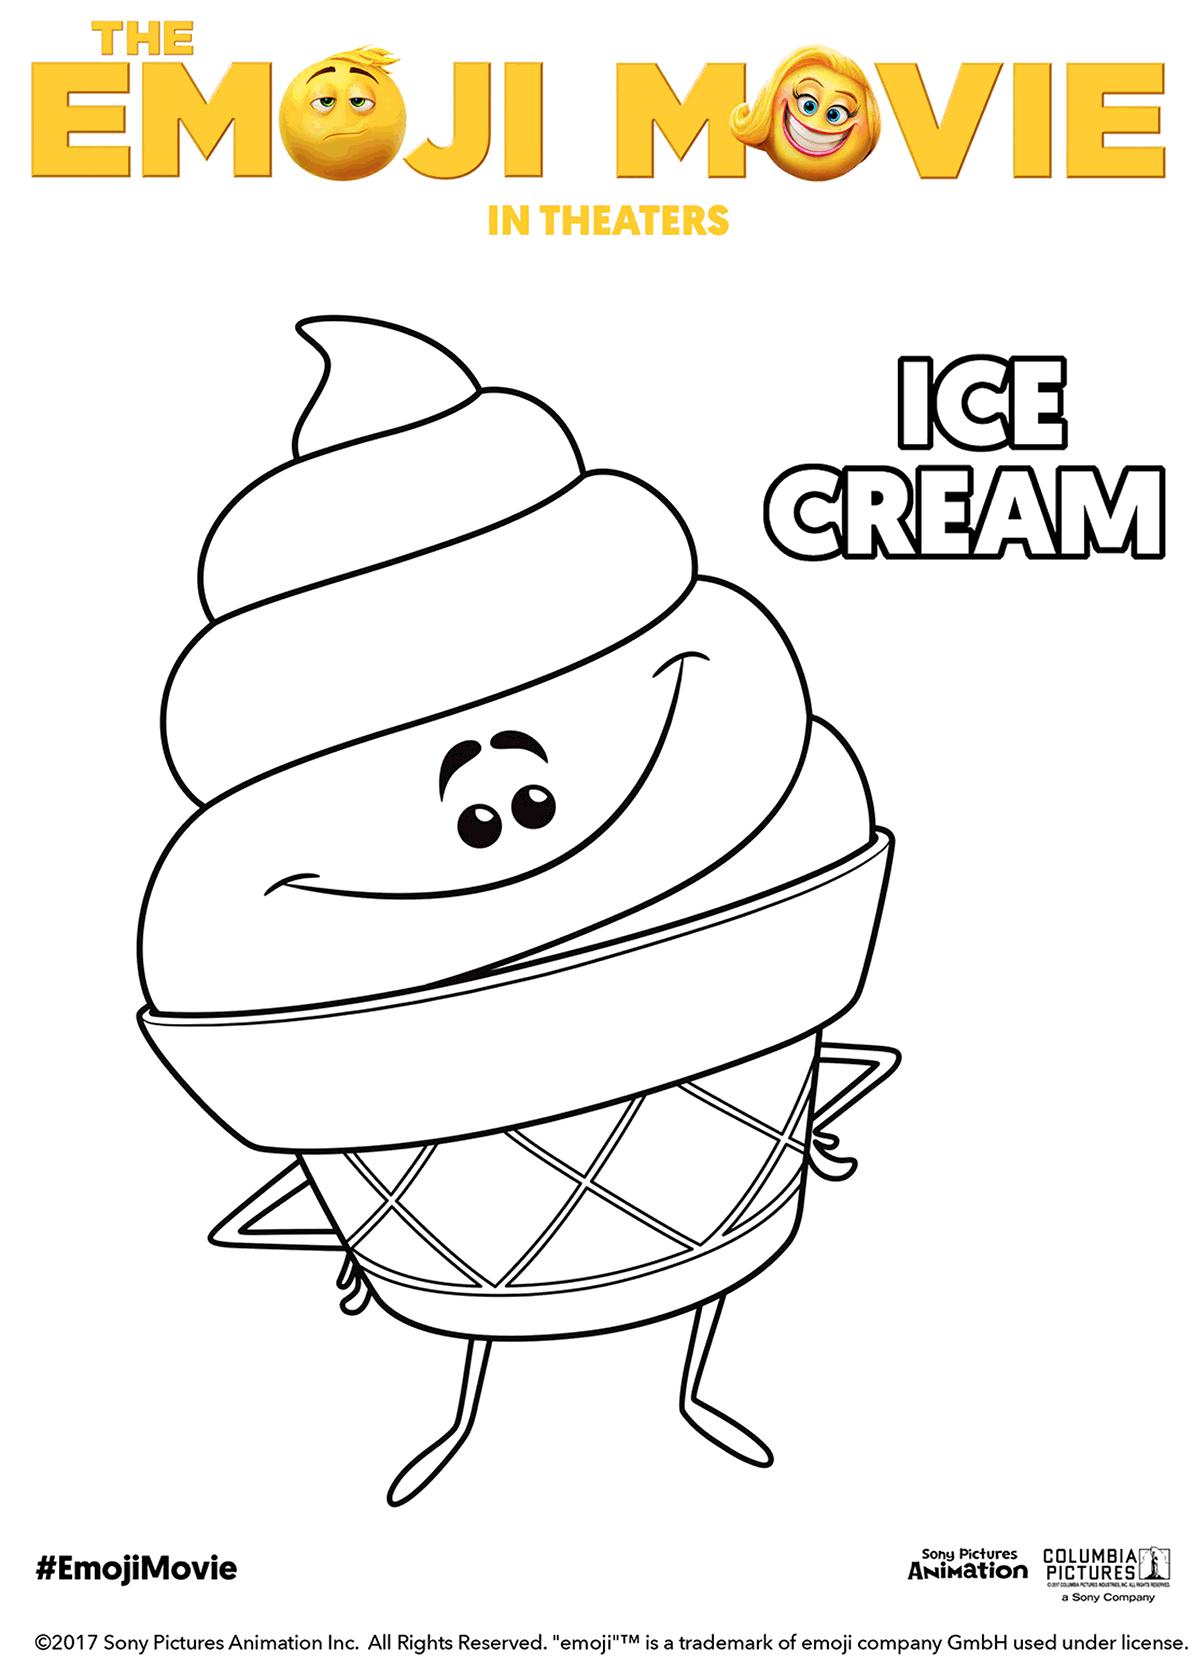 The Emoji Movie Ice Cream Coloring Pages Emoji Coloring Pages Emoji Movie Coloring Pages